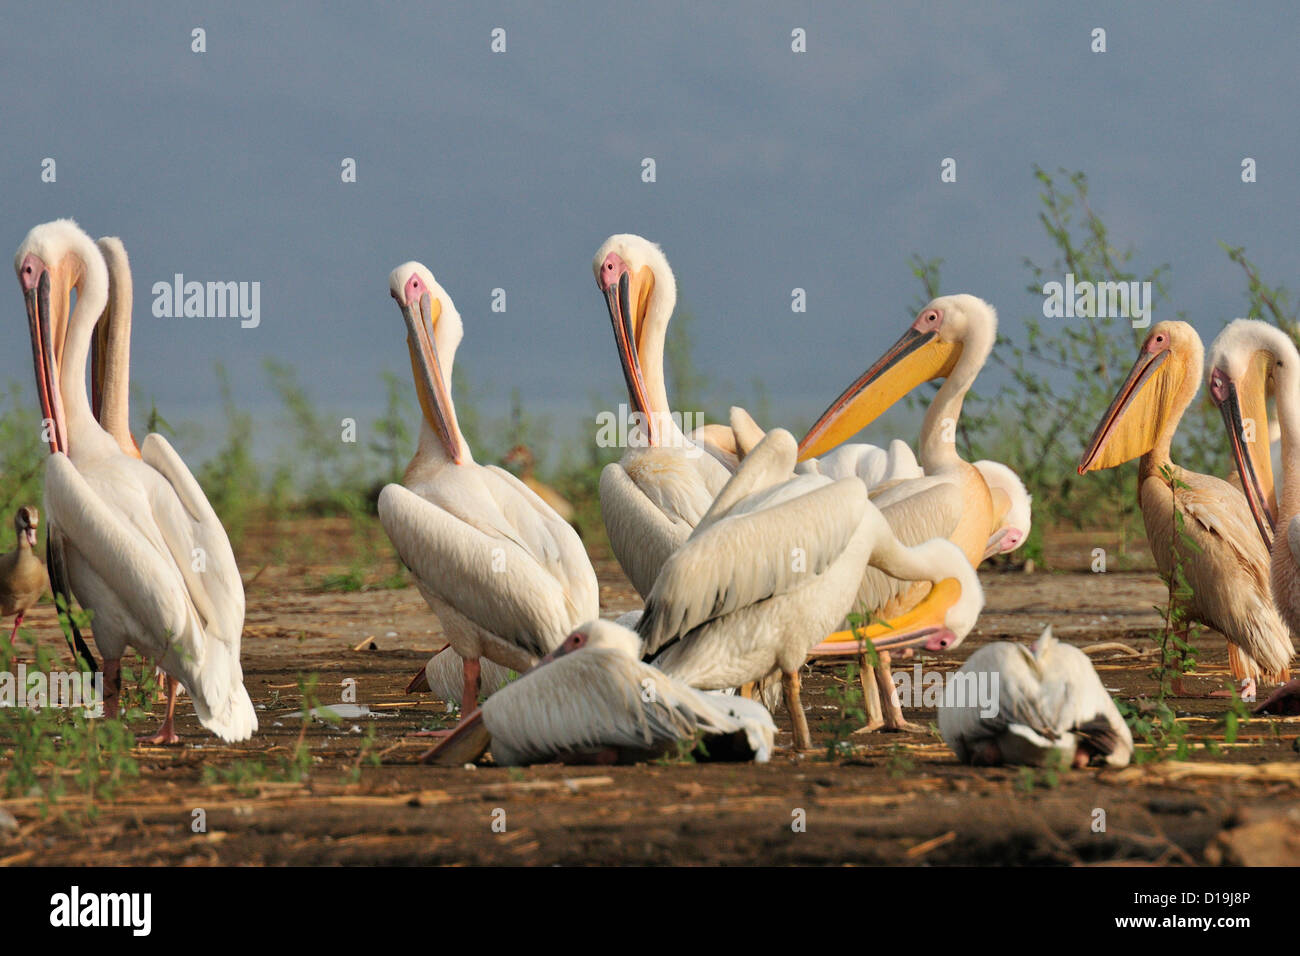 Great White Pelican Pelecanus onocrotalus, Chawo Lake, Nechisar National Park, Arna Minch, Etiopia, Africa Stock Photo